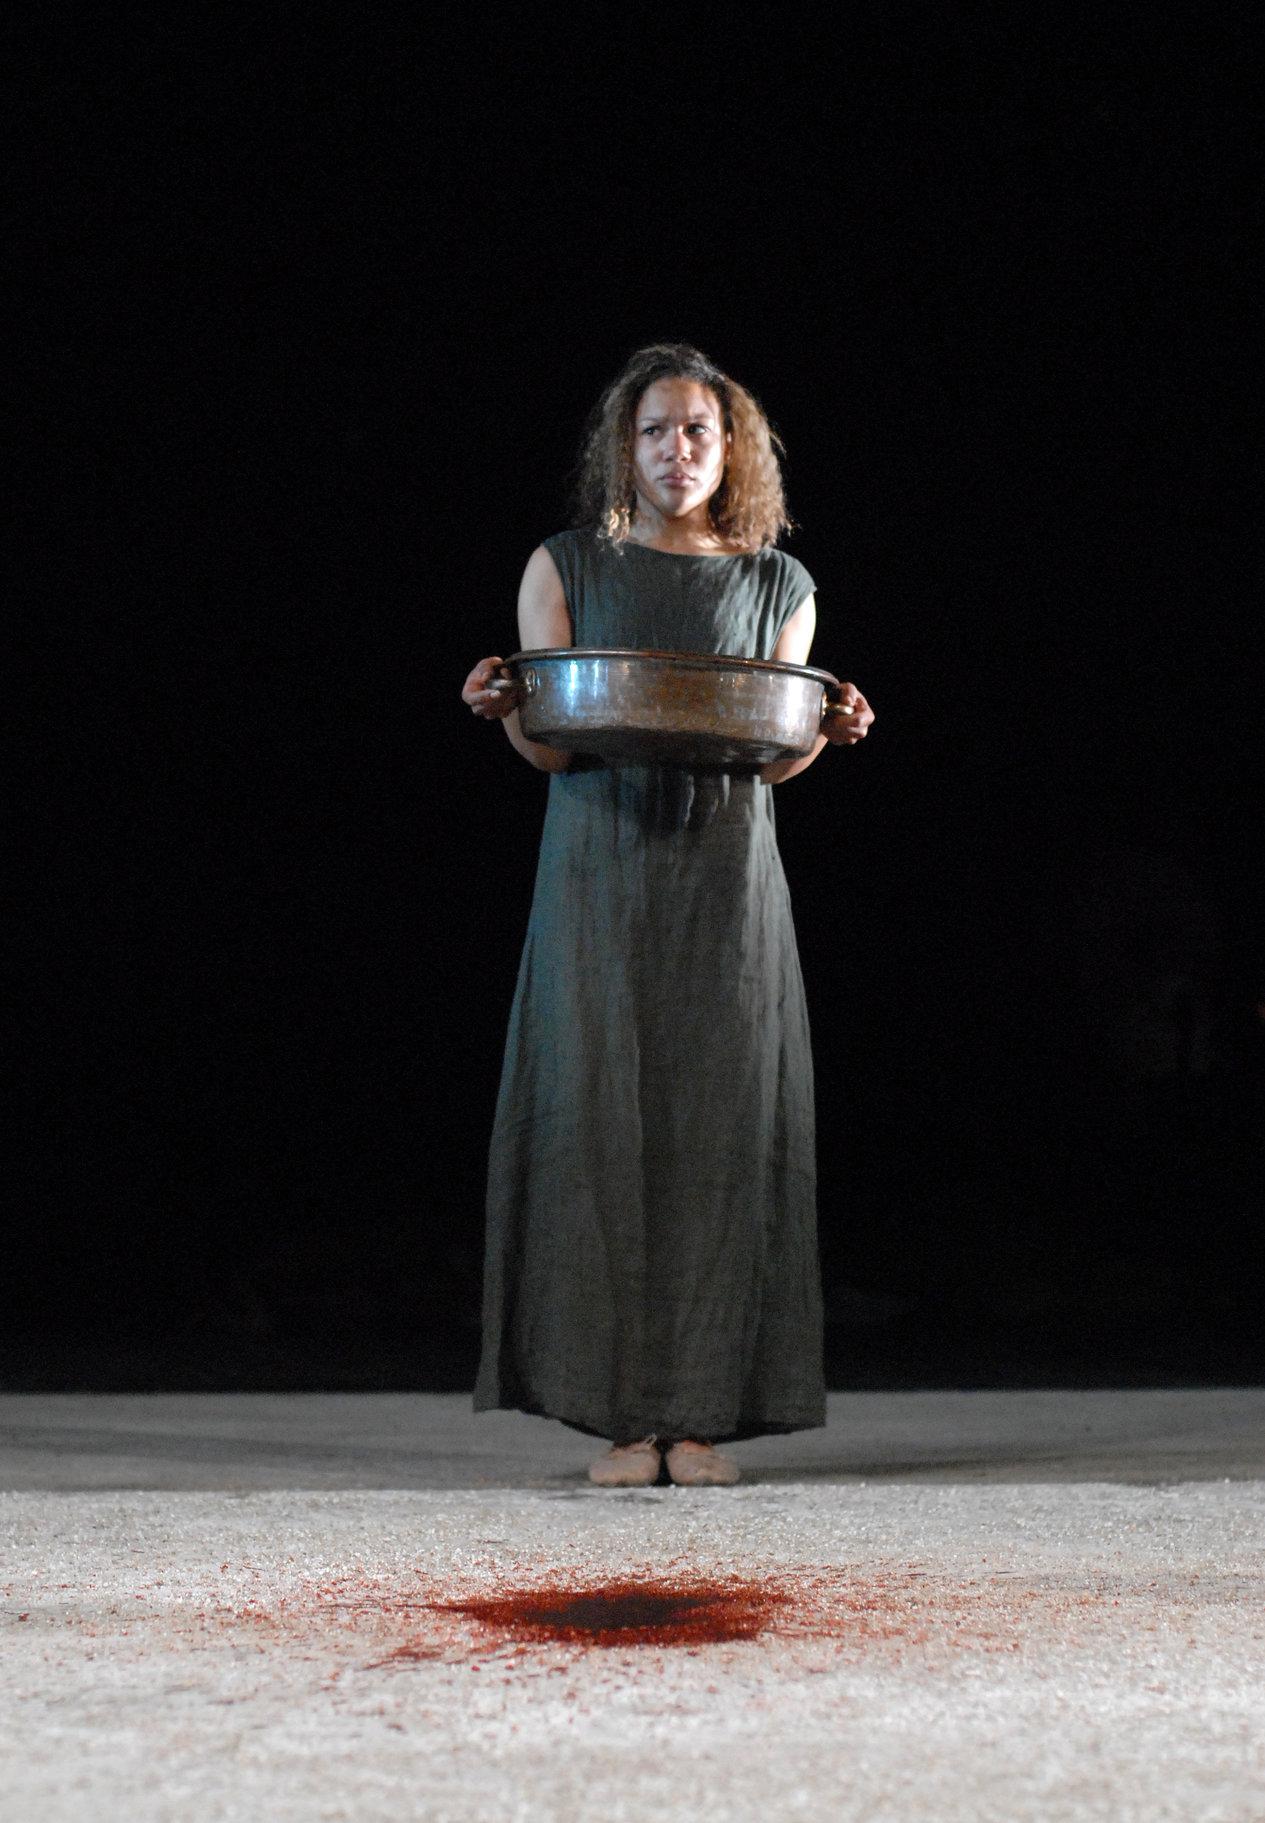 Calphurnia standing holding a metal dish